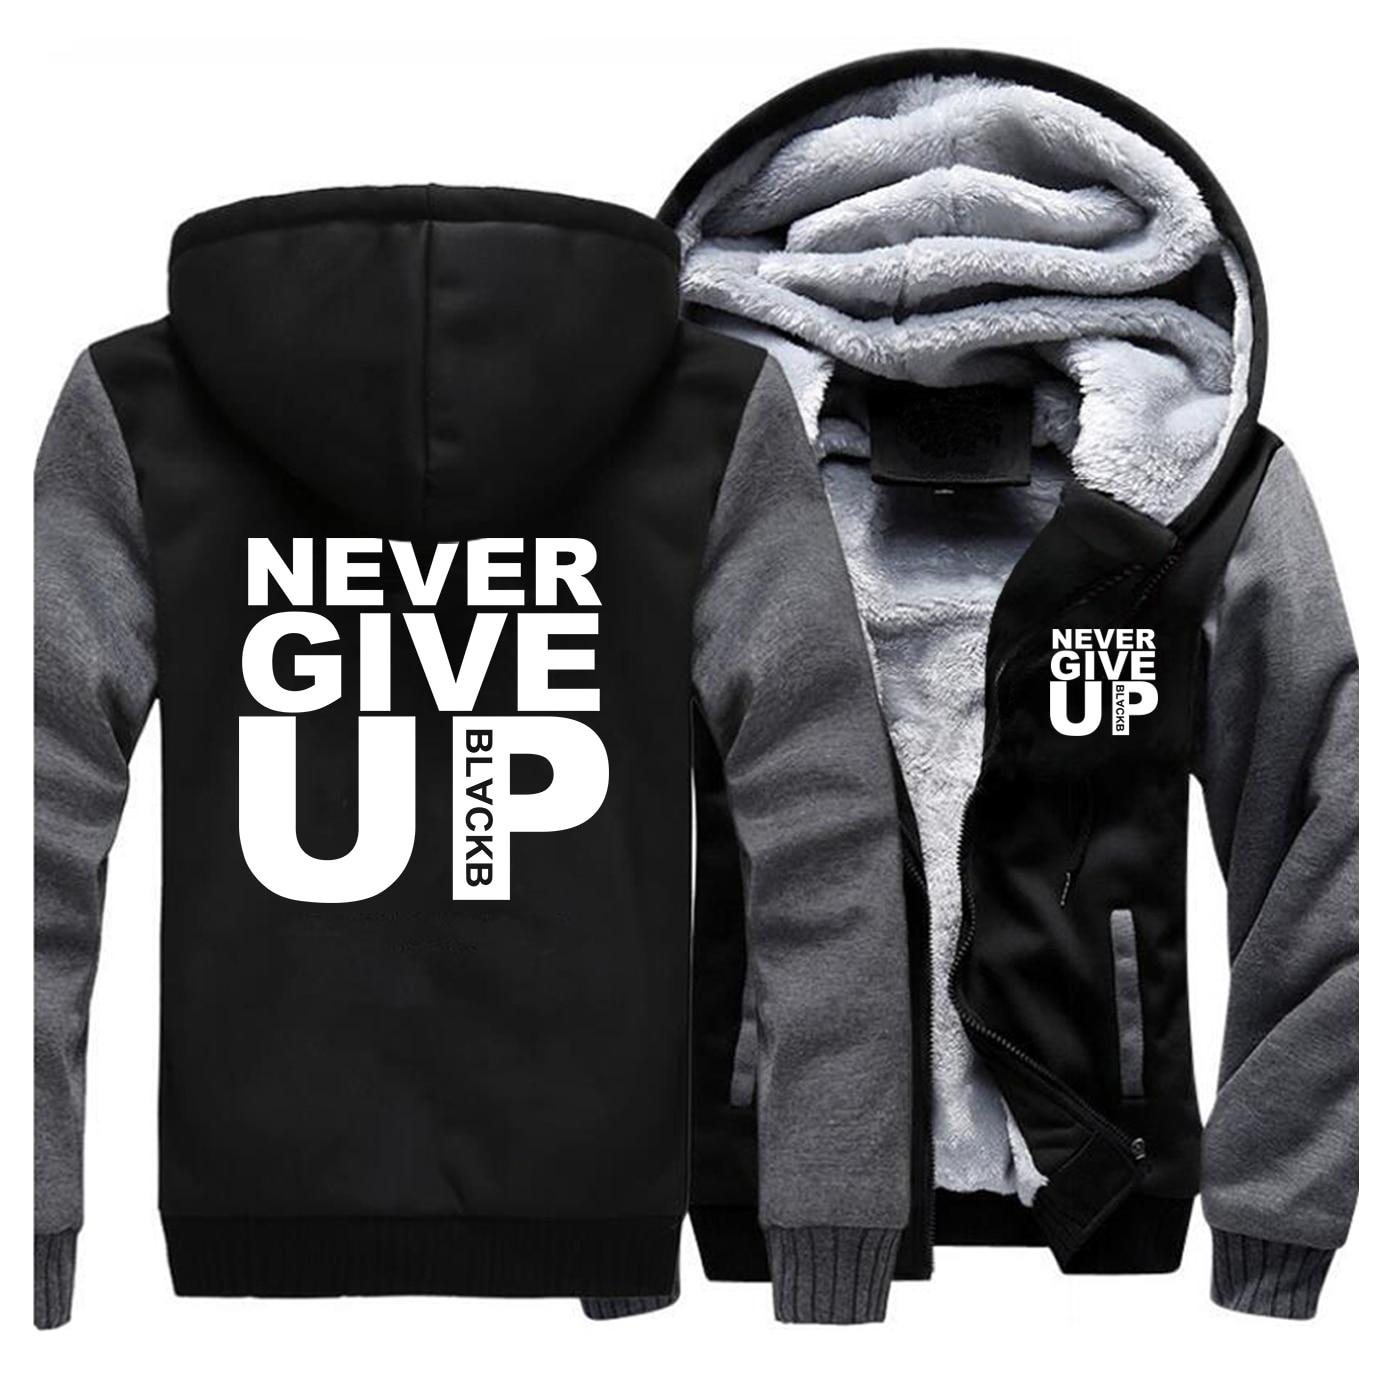 You Never Walk Alone Never Give Up Liverpool Fleece thick Hoodies Men Sportswear 2020 casual warm sweatshirt Streetwear jacket